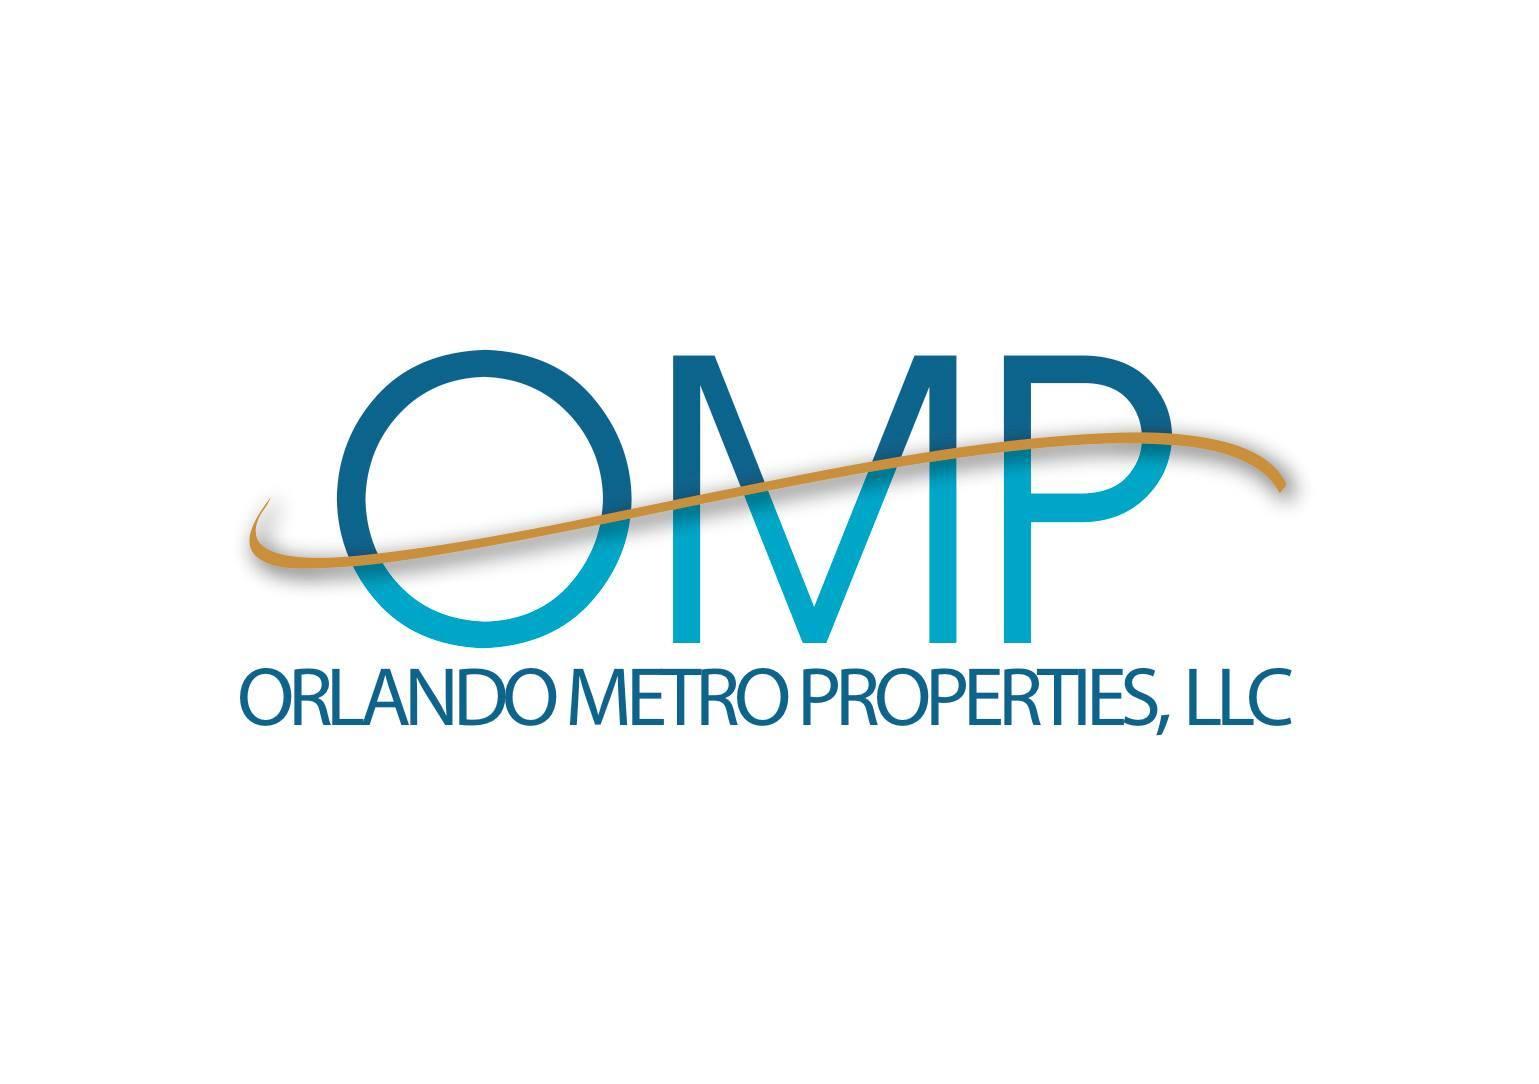 ORLANDO METRO PROPERTIES LLC.